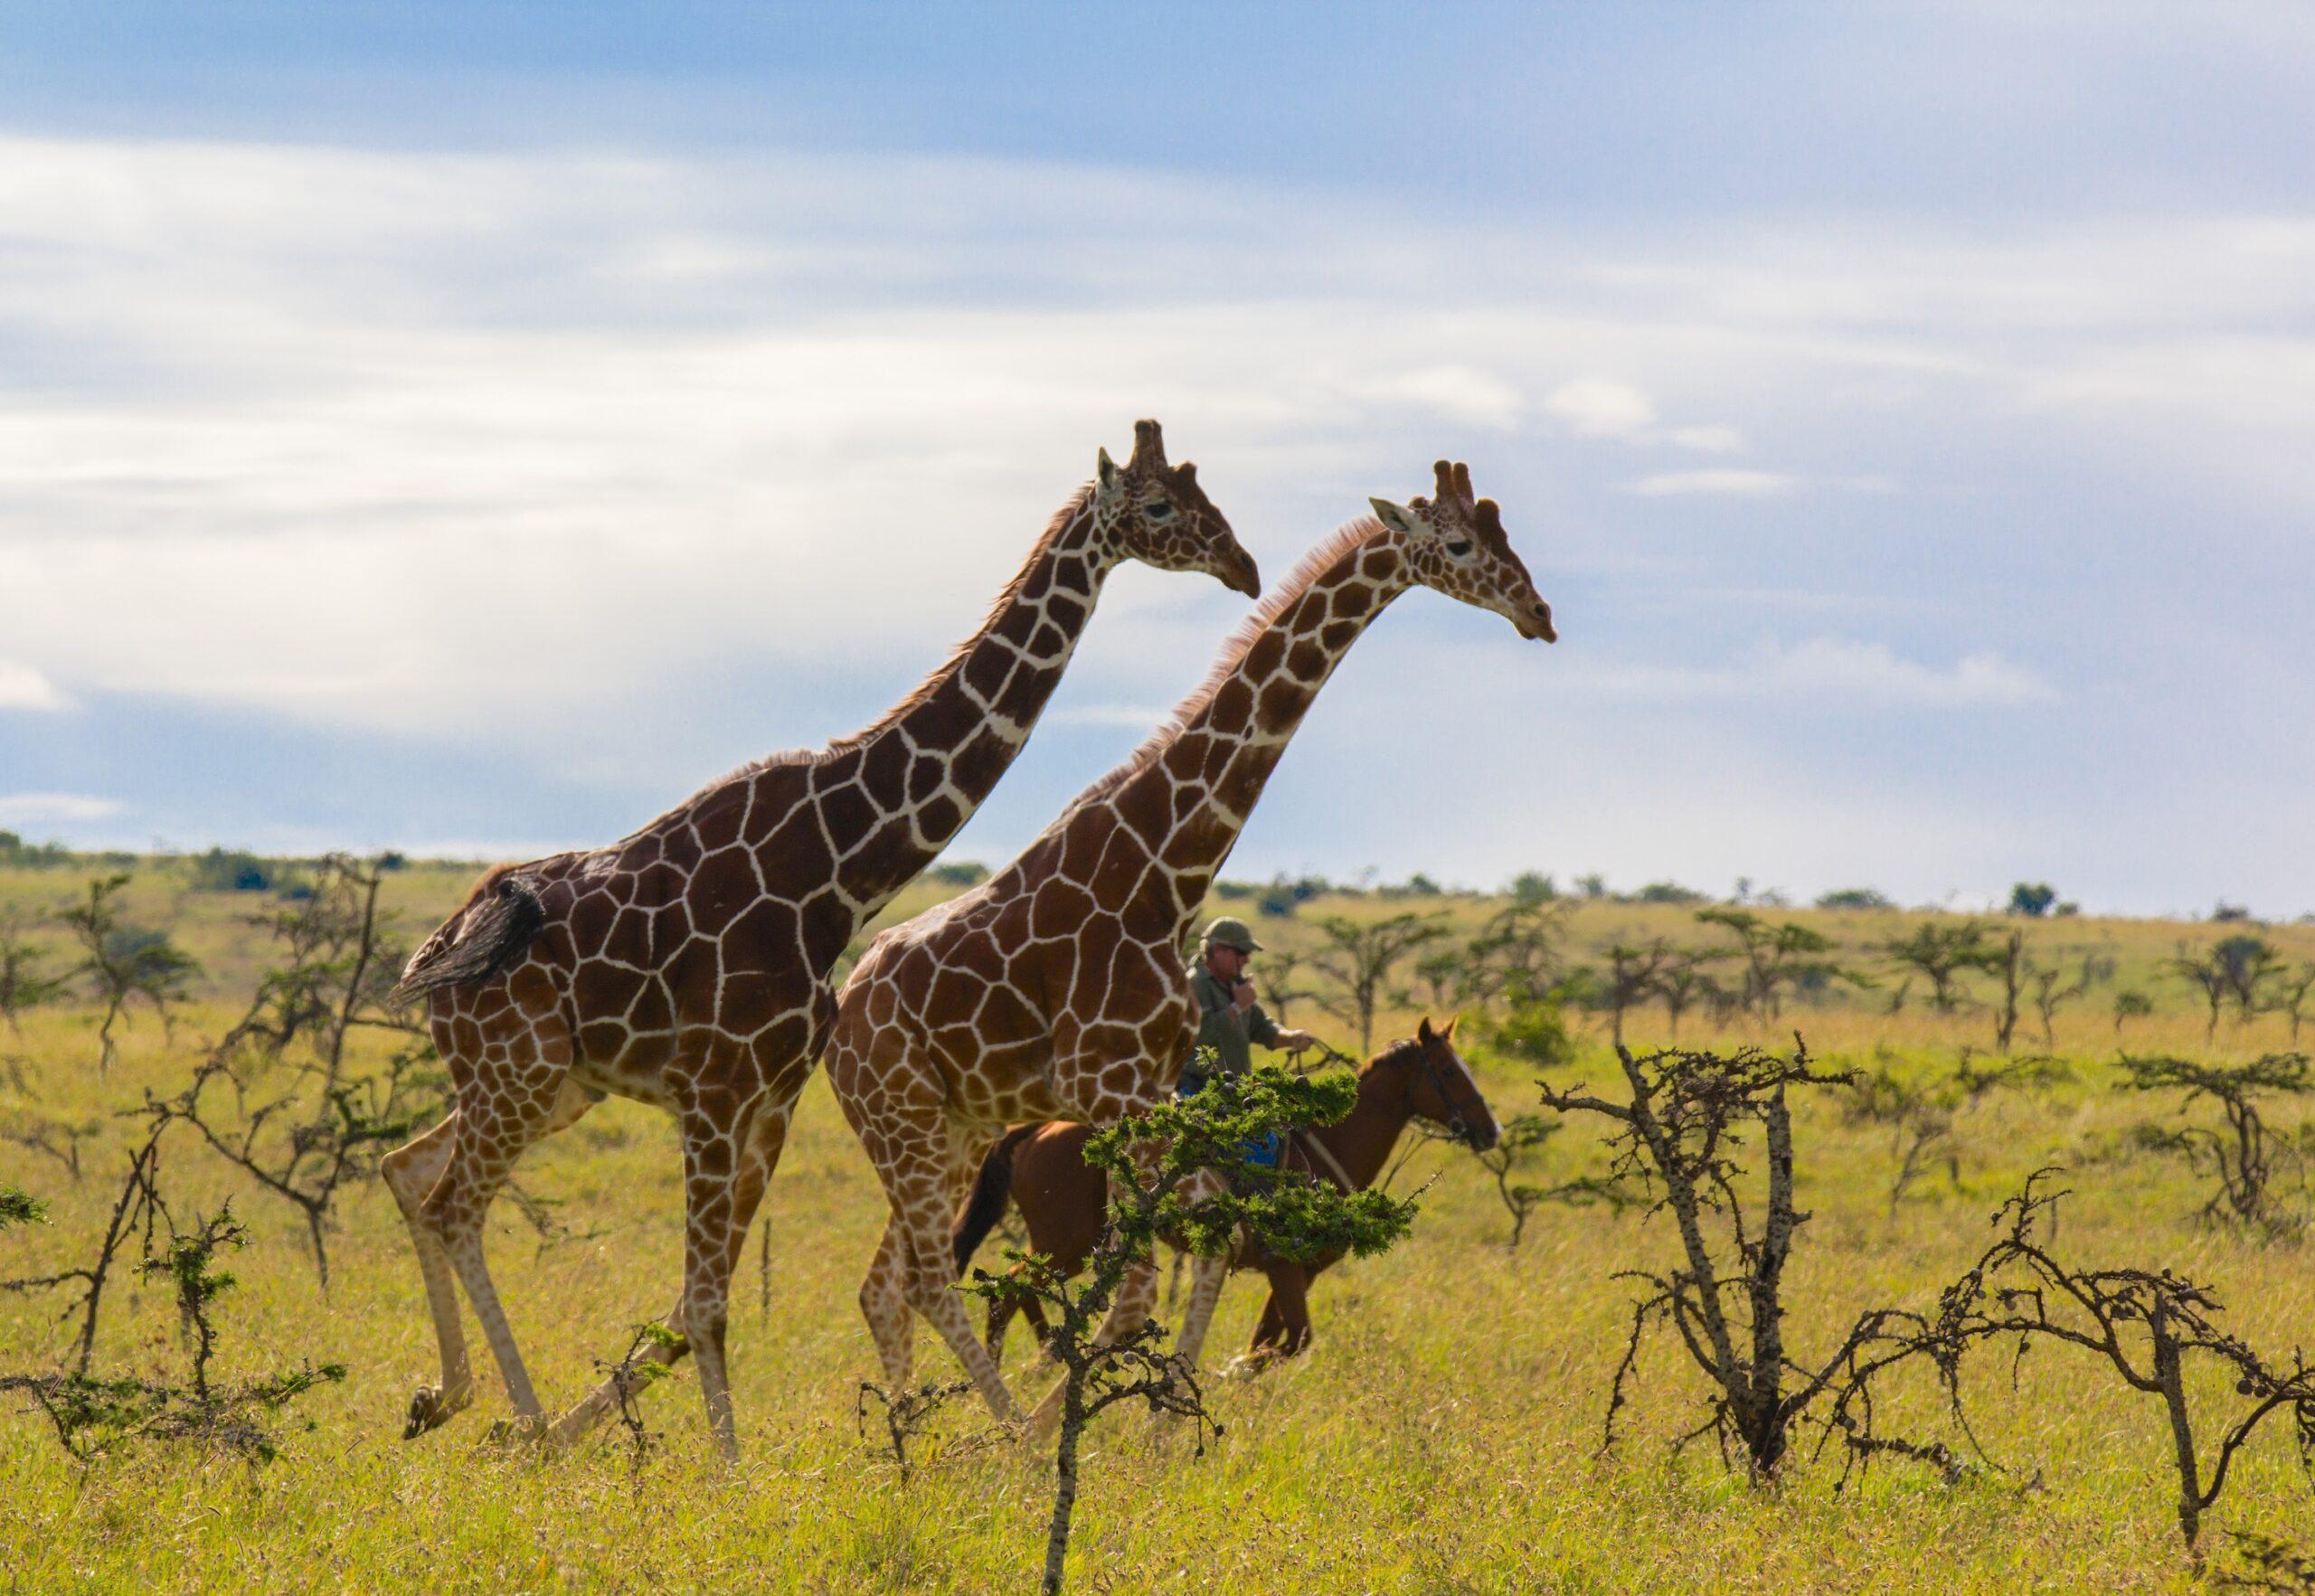 Safari te paard in Borana Lodge / Kenia - Vakantie te paard / Reisbureau Perlan